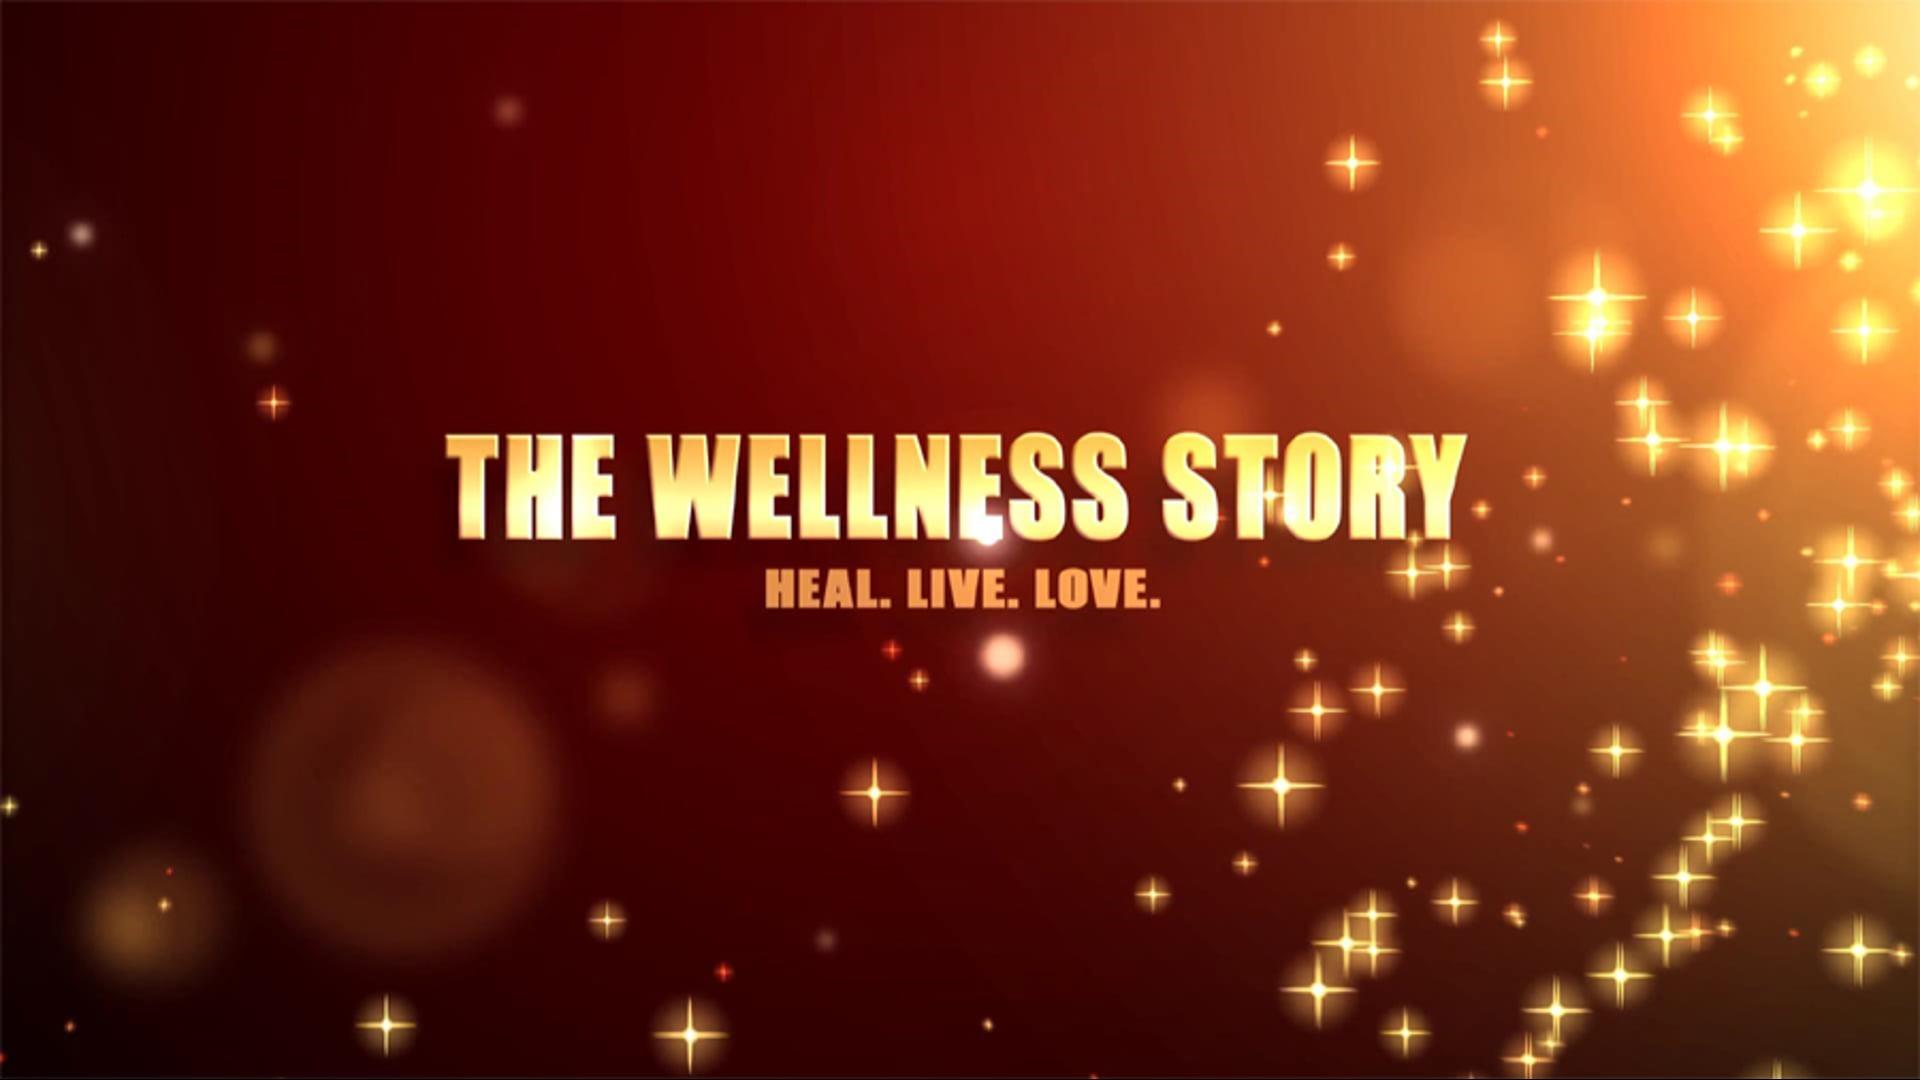 The Wellness Story